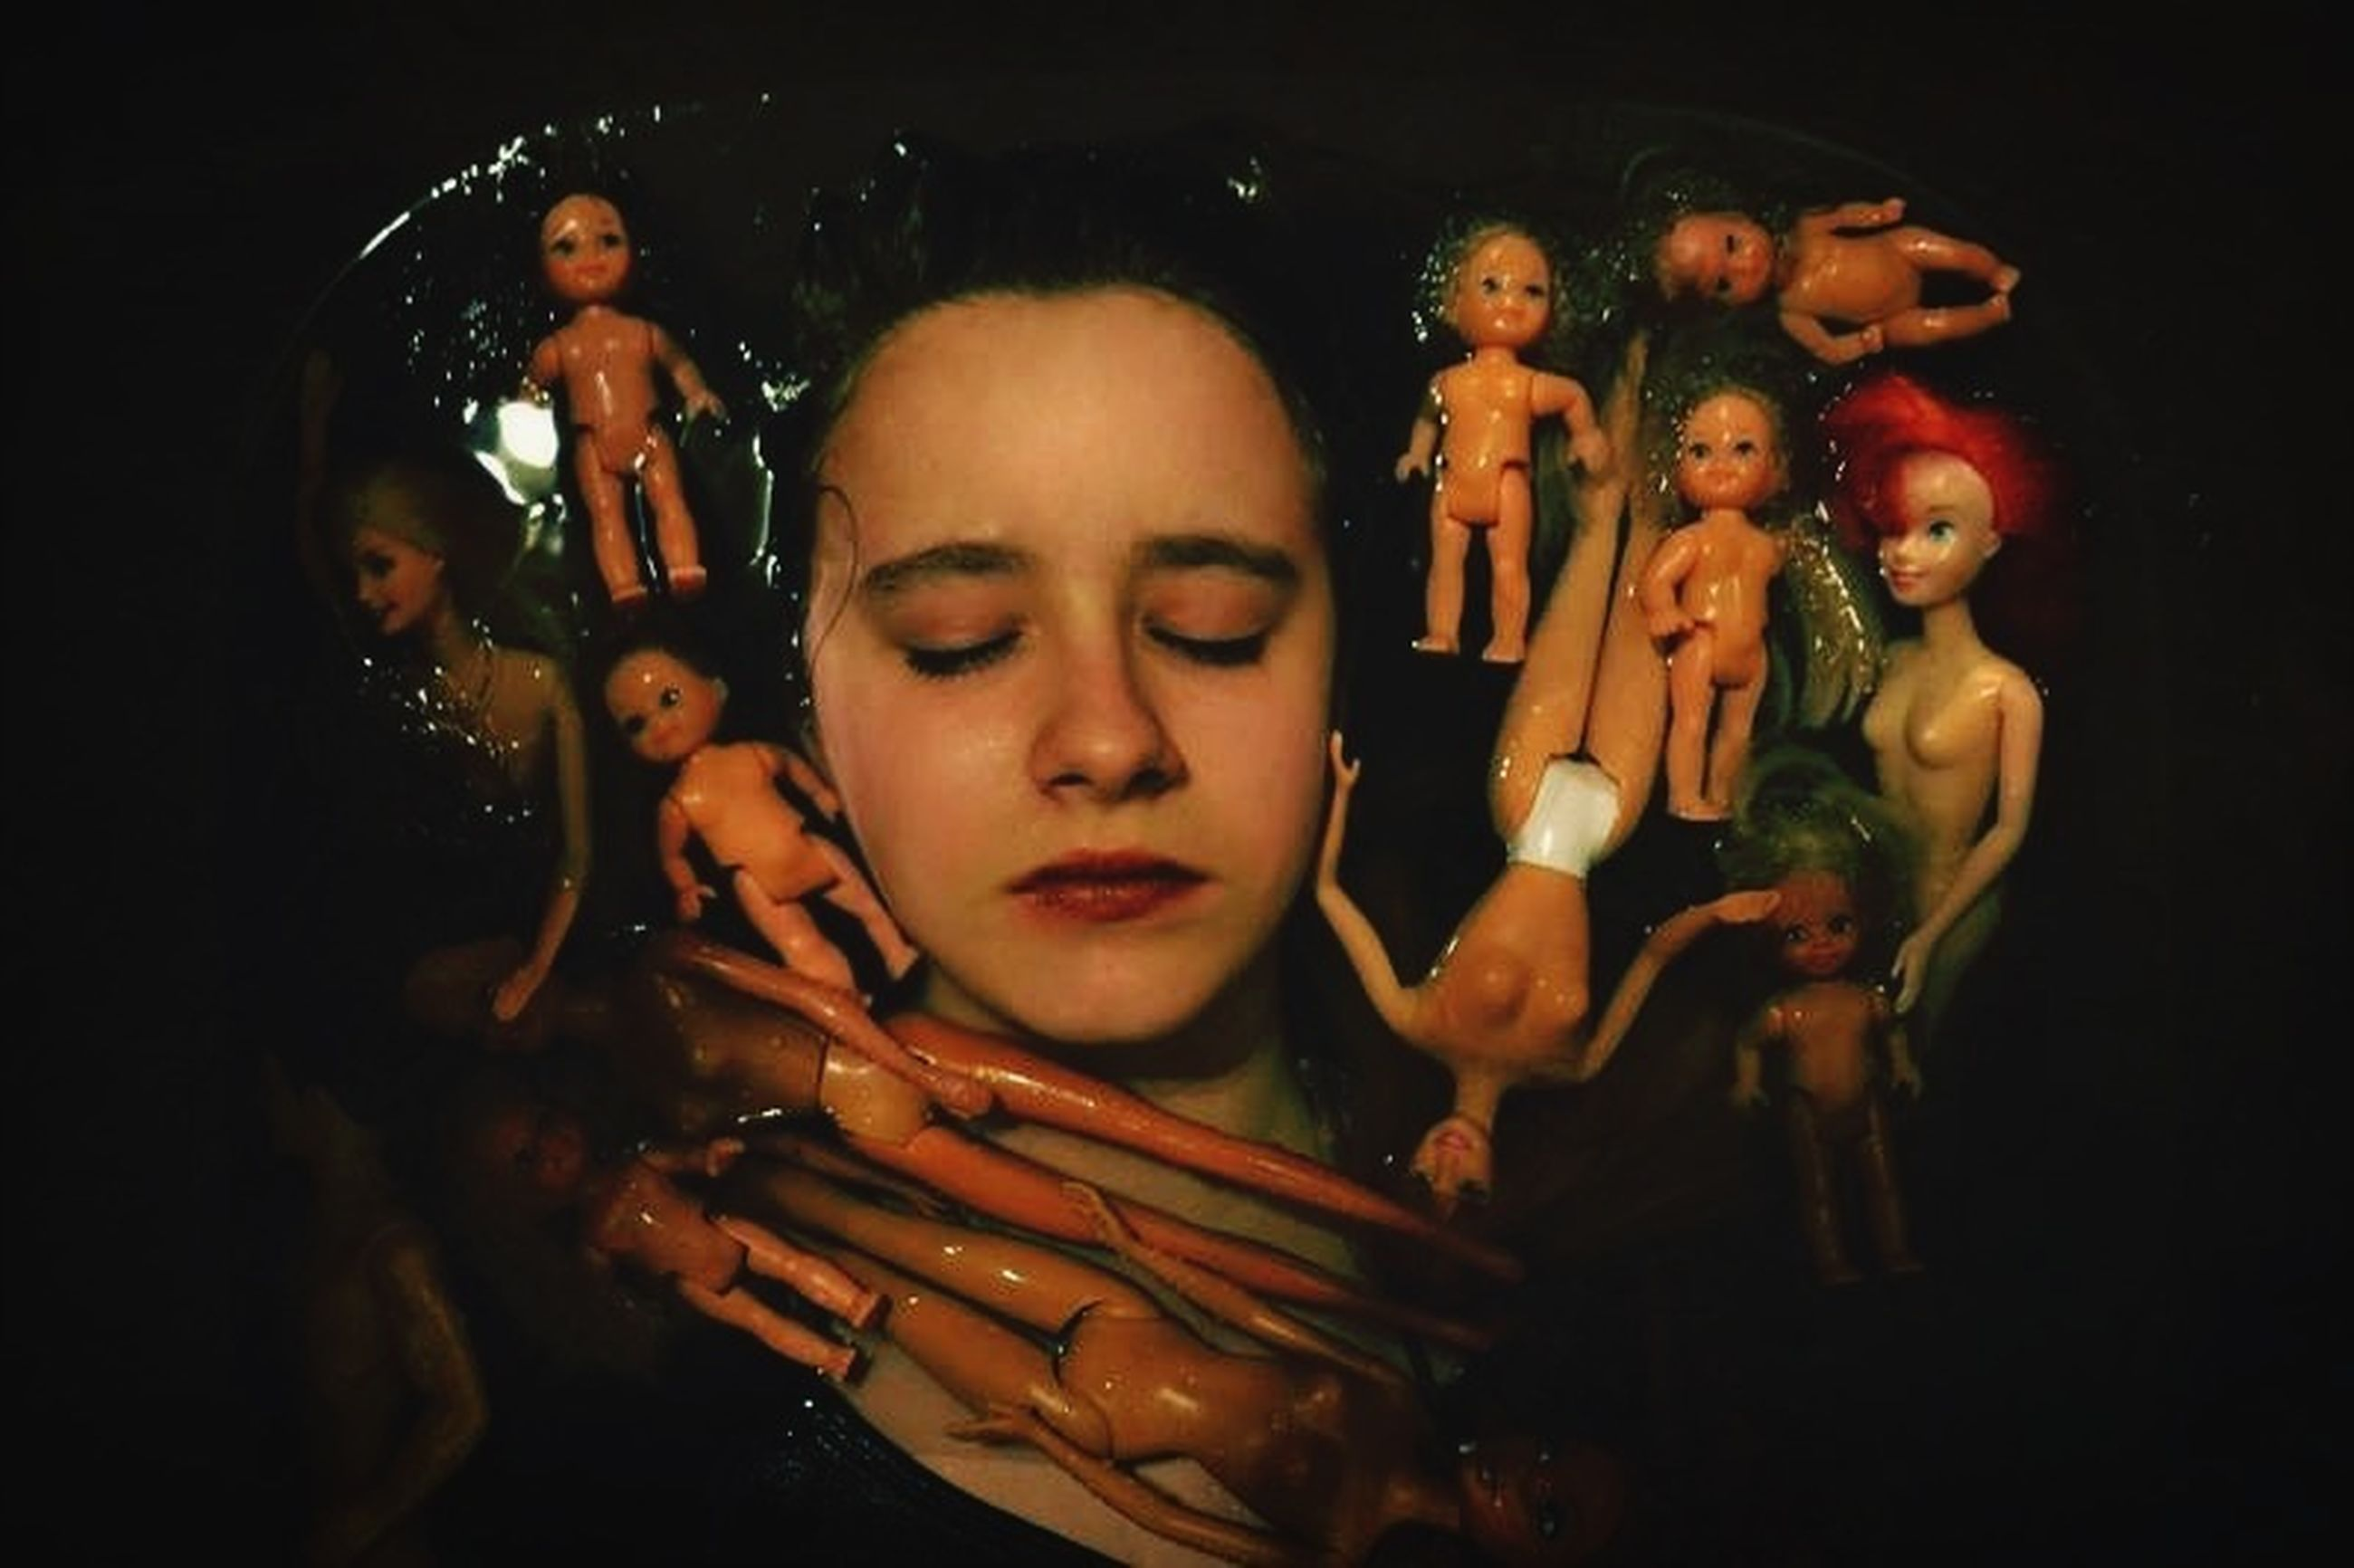 human representation, indoors, art, creativity, art and craft, religion, tradition, statue, illuminated, spirituality, cultures, night, sculpture, celebration, figurine, flame